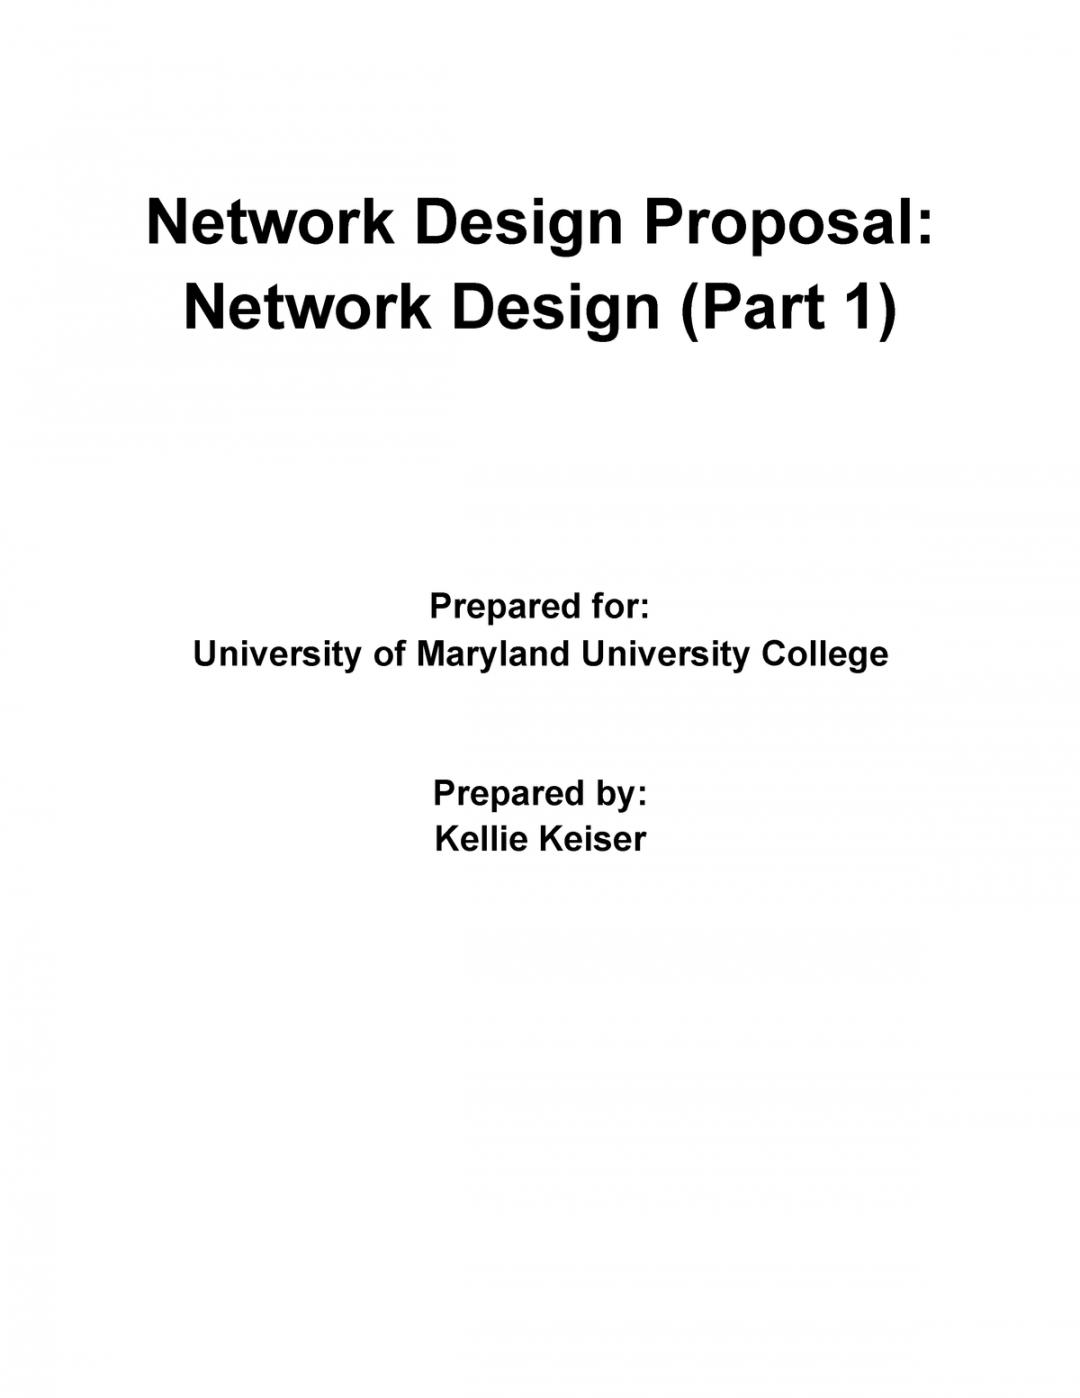 free network design proposal part 1  cmit 265  umuc  studocu network design proposal template example